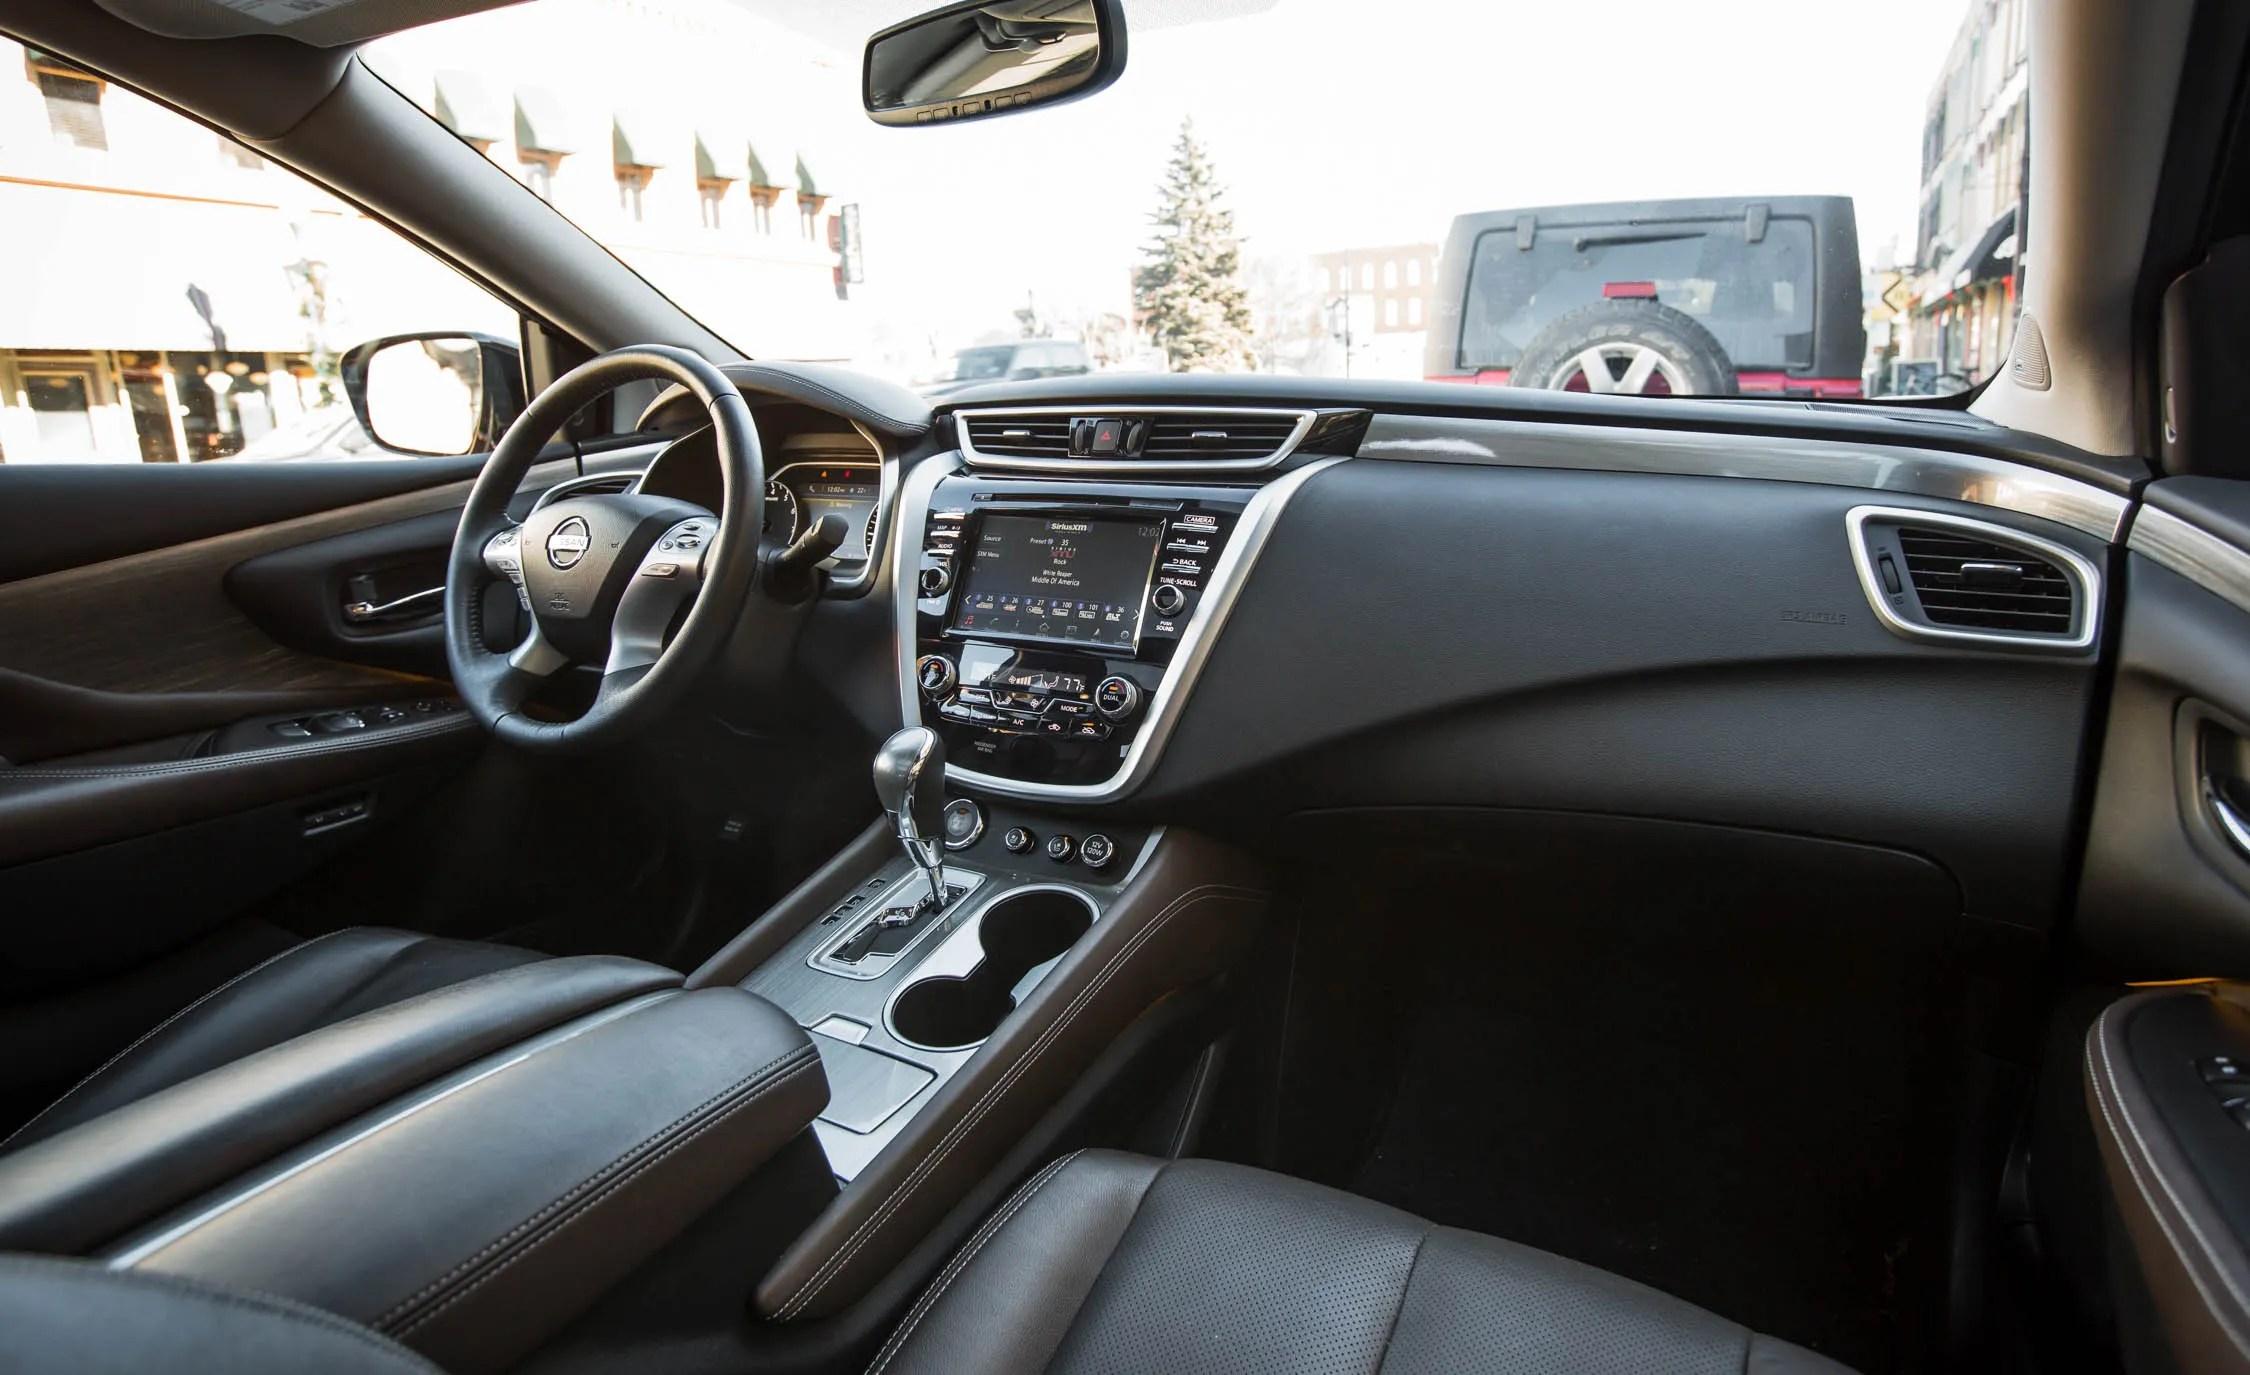 2015 Nissan Murano Platinum AWD Interior Dashboard